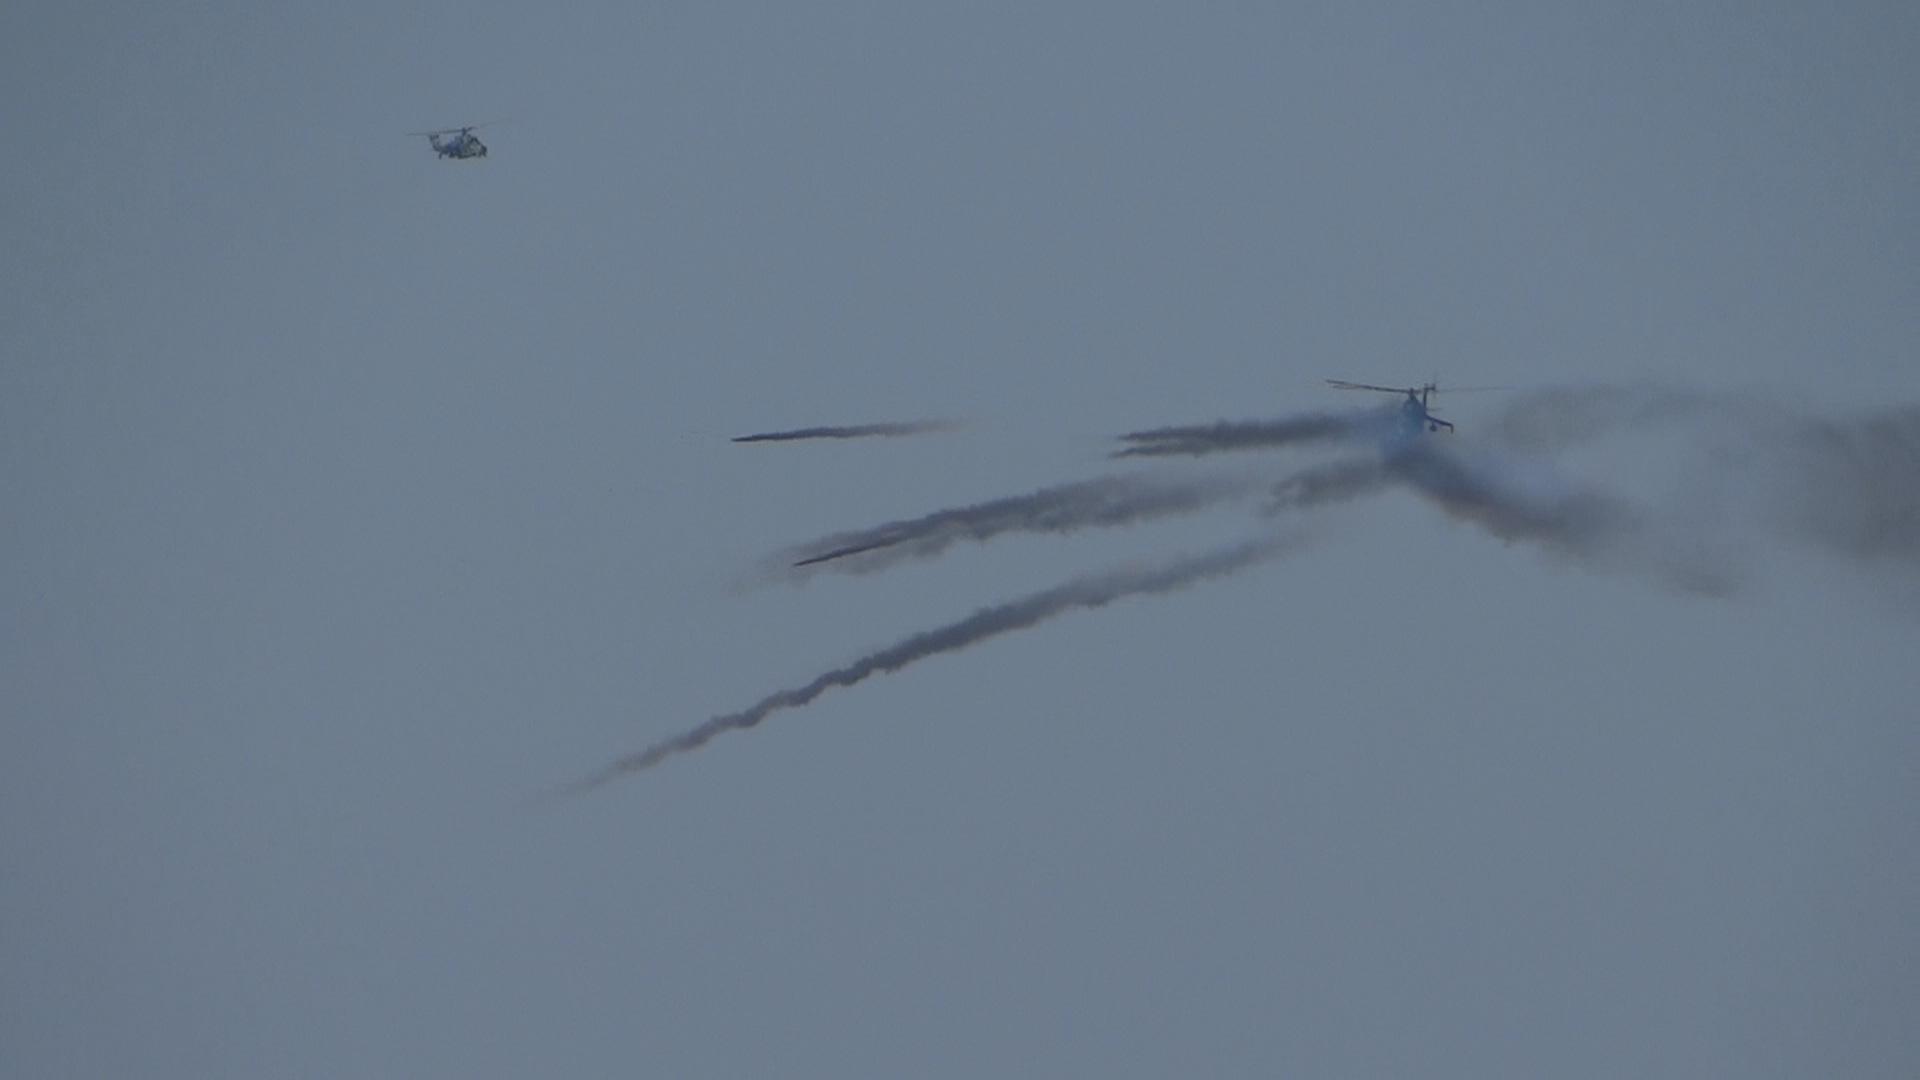 Myanmar Air Force Strikes KIA's Kungsa Post, Artillery Units Fire Multiple  Motors